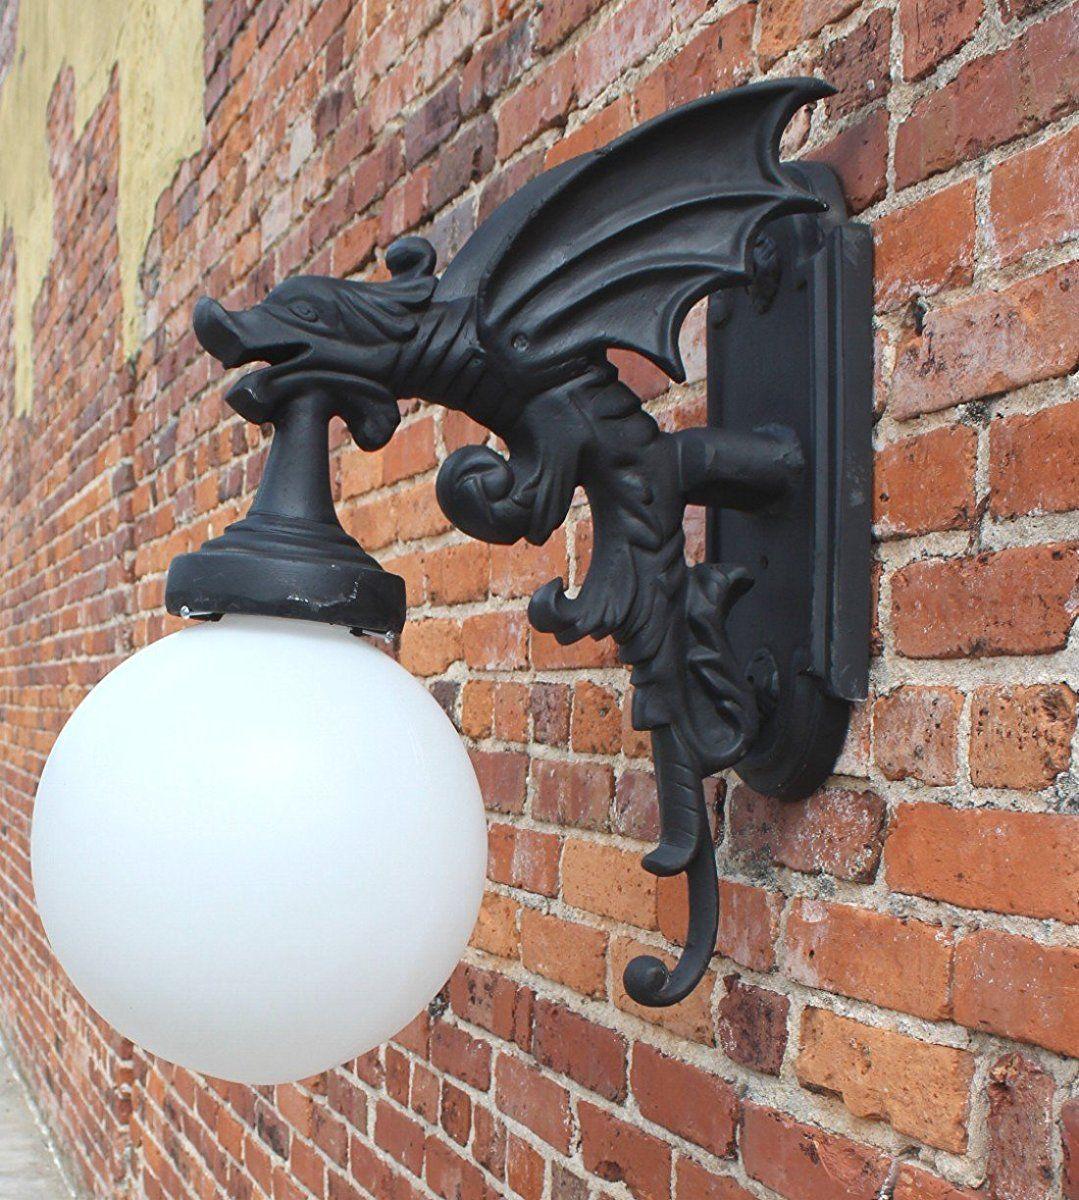 The Kings Bay Gargoyle Dragon Wing Outdoor Wall Light Fixture